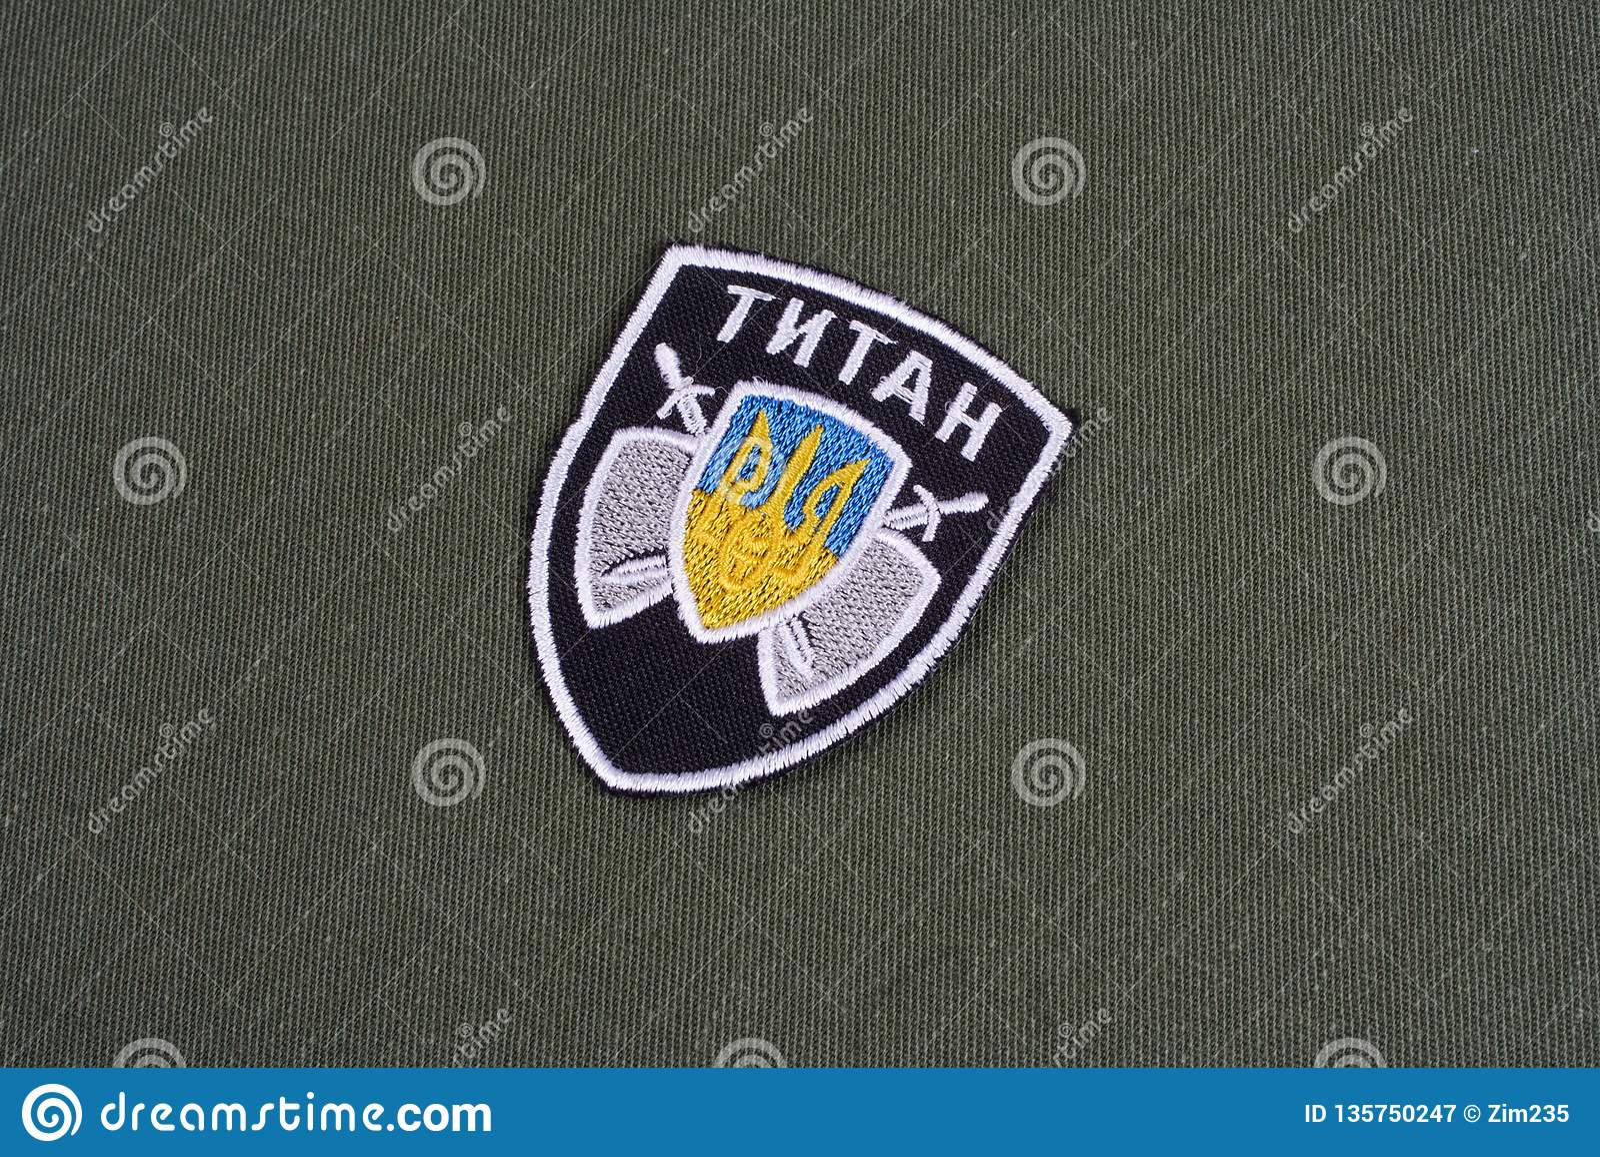 KYIV,乌克兰- 2015年7月, 16日 内务部(乌克兰) -在被伪装的制服的巨人单位一致的徽章